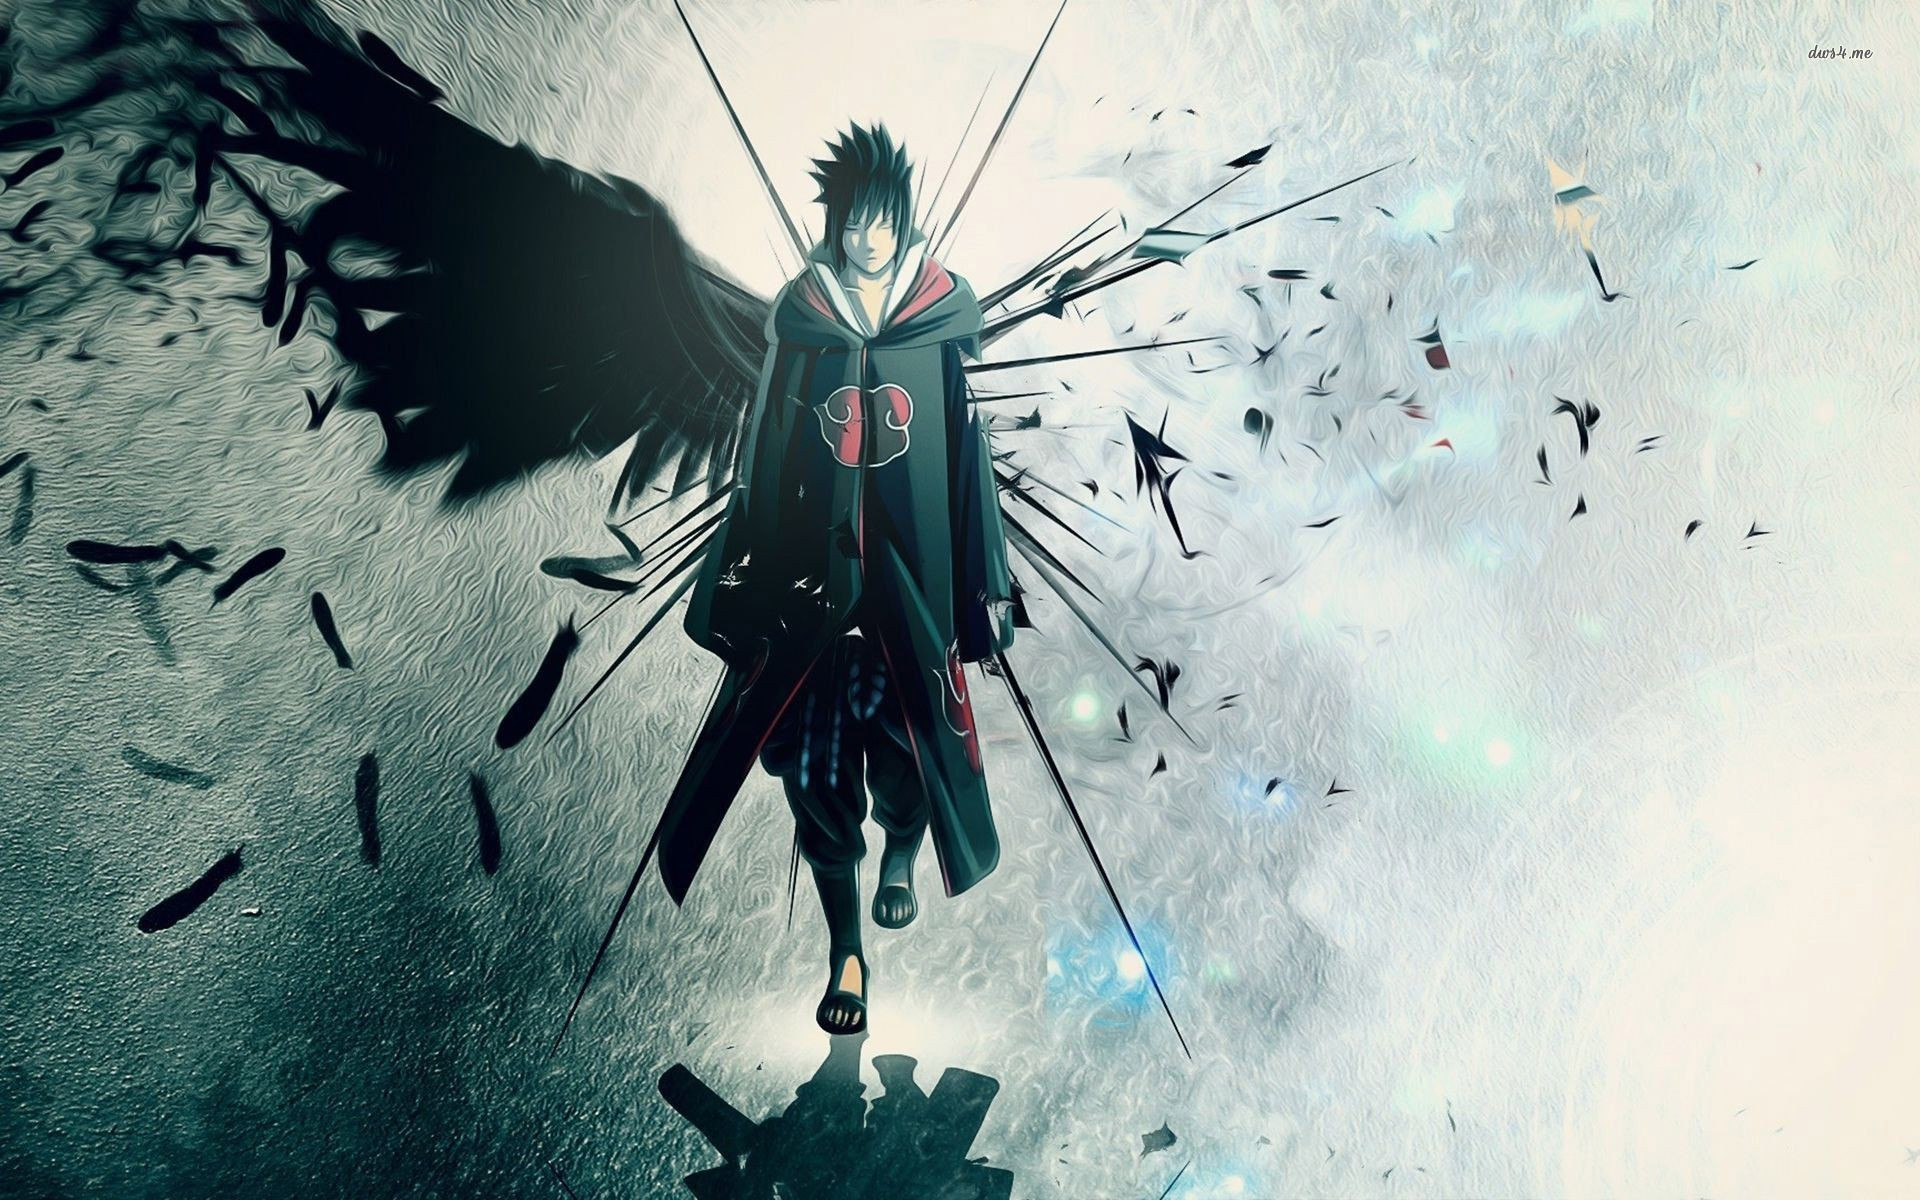 Xk Anime Wallpaper X For Hd P